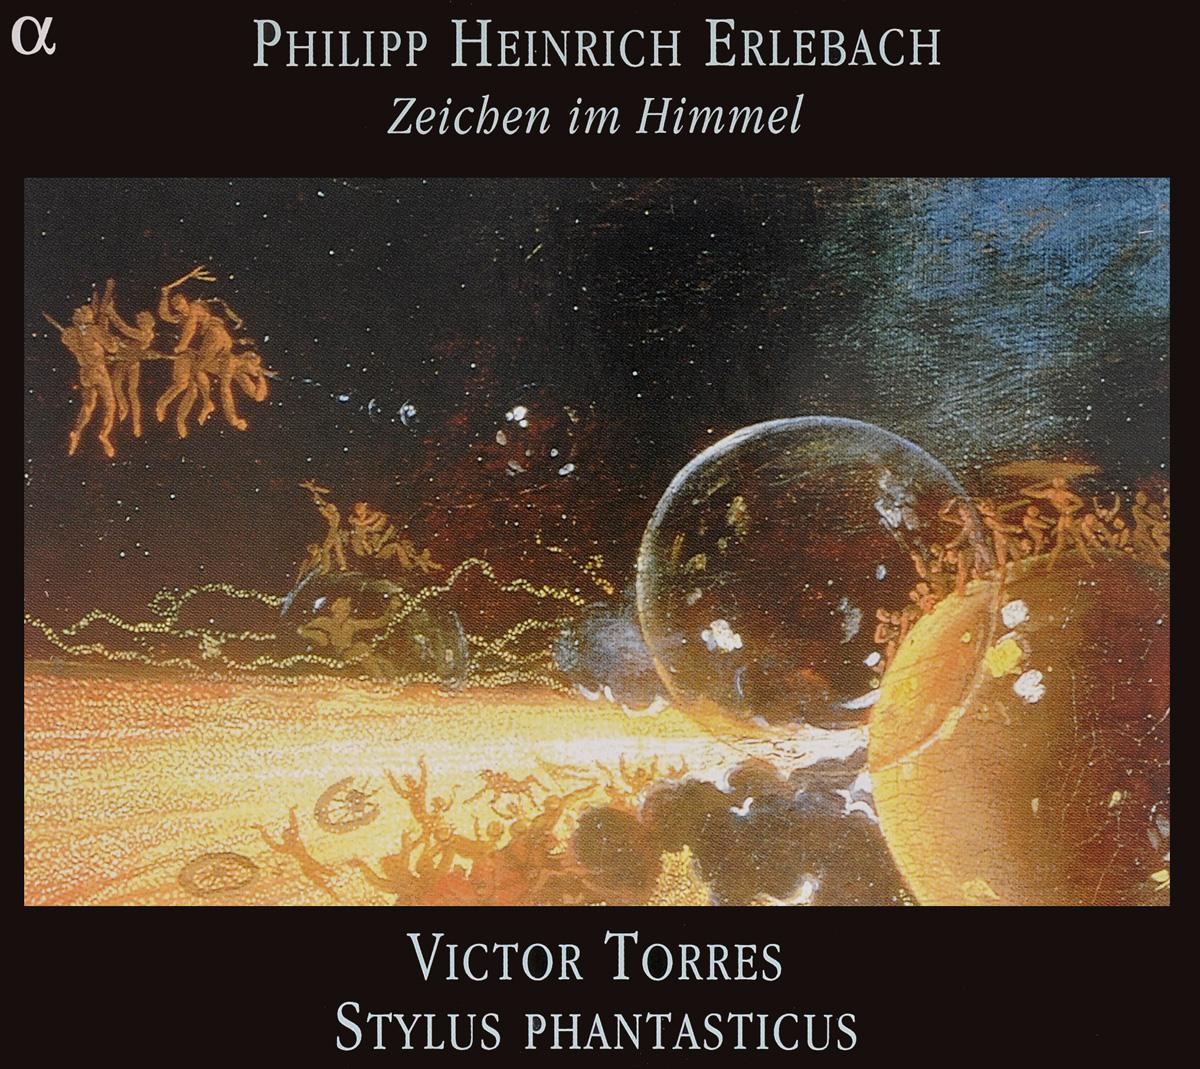 Philipp Heinrich Erlebach - Victor Torres, Stylus Phantasticus. Zeichen Im Himmel ammeter multitester 2000 counts resistance capacitance inductance temperature victor digital multimeter vc9805a